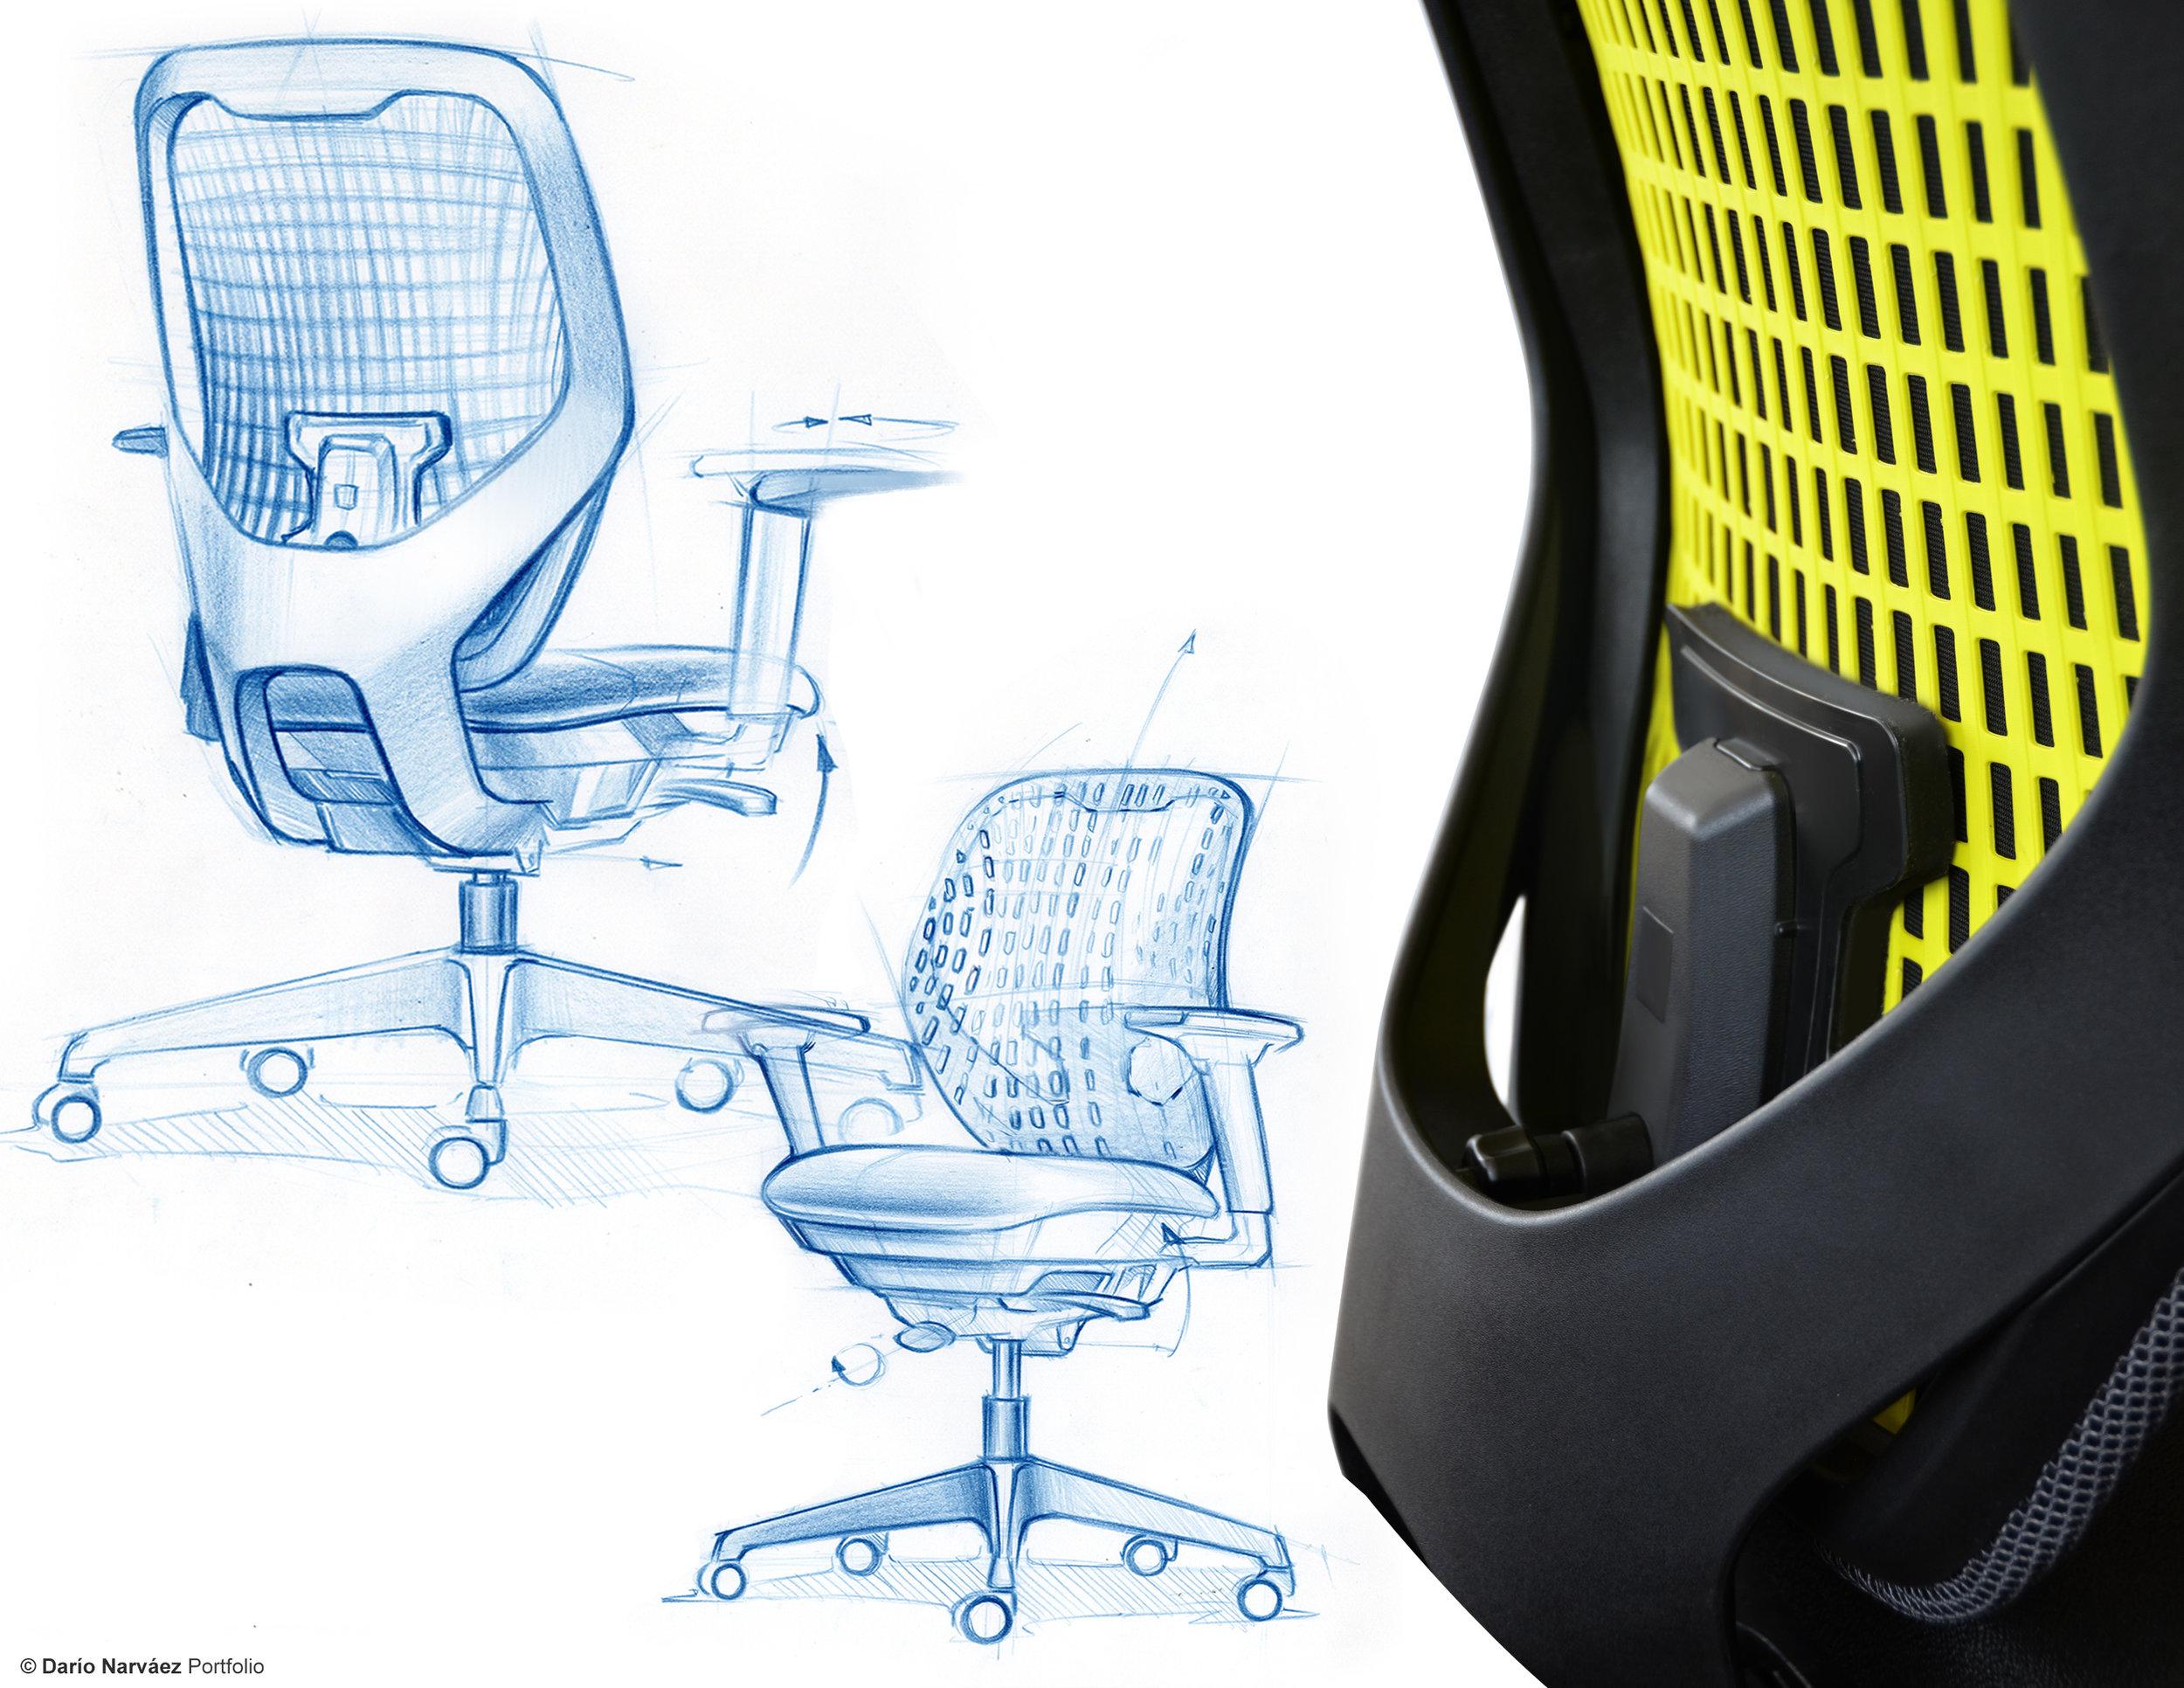 02H_DarioNarvaez_Portfolio_Ingo_Chair_Concept_Development_WEB-4.jpg